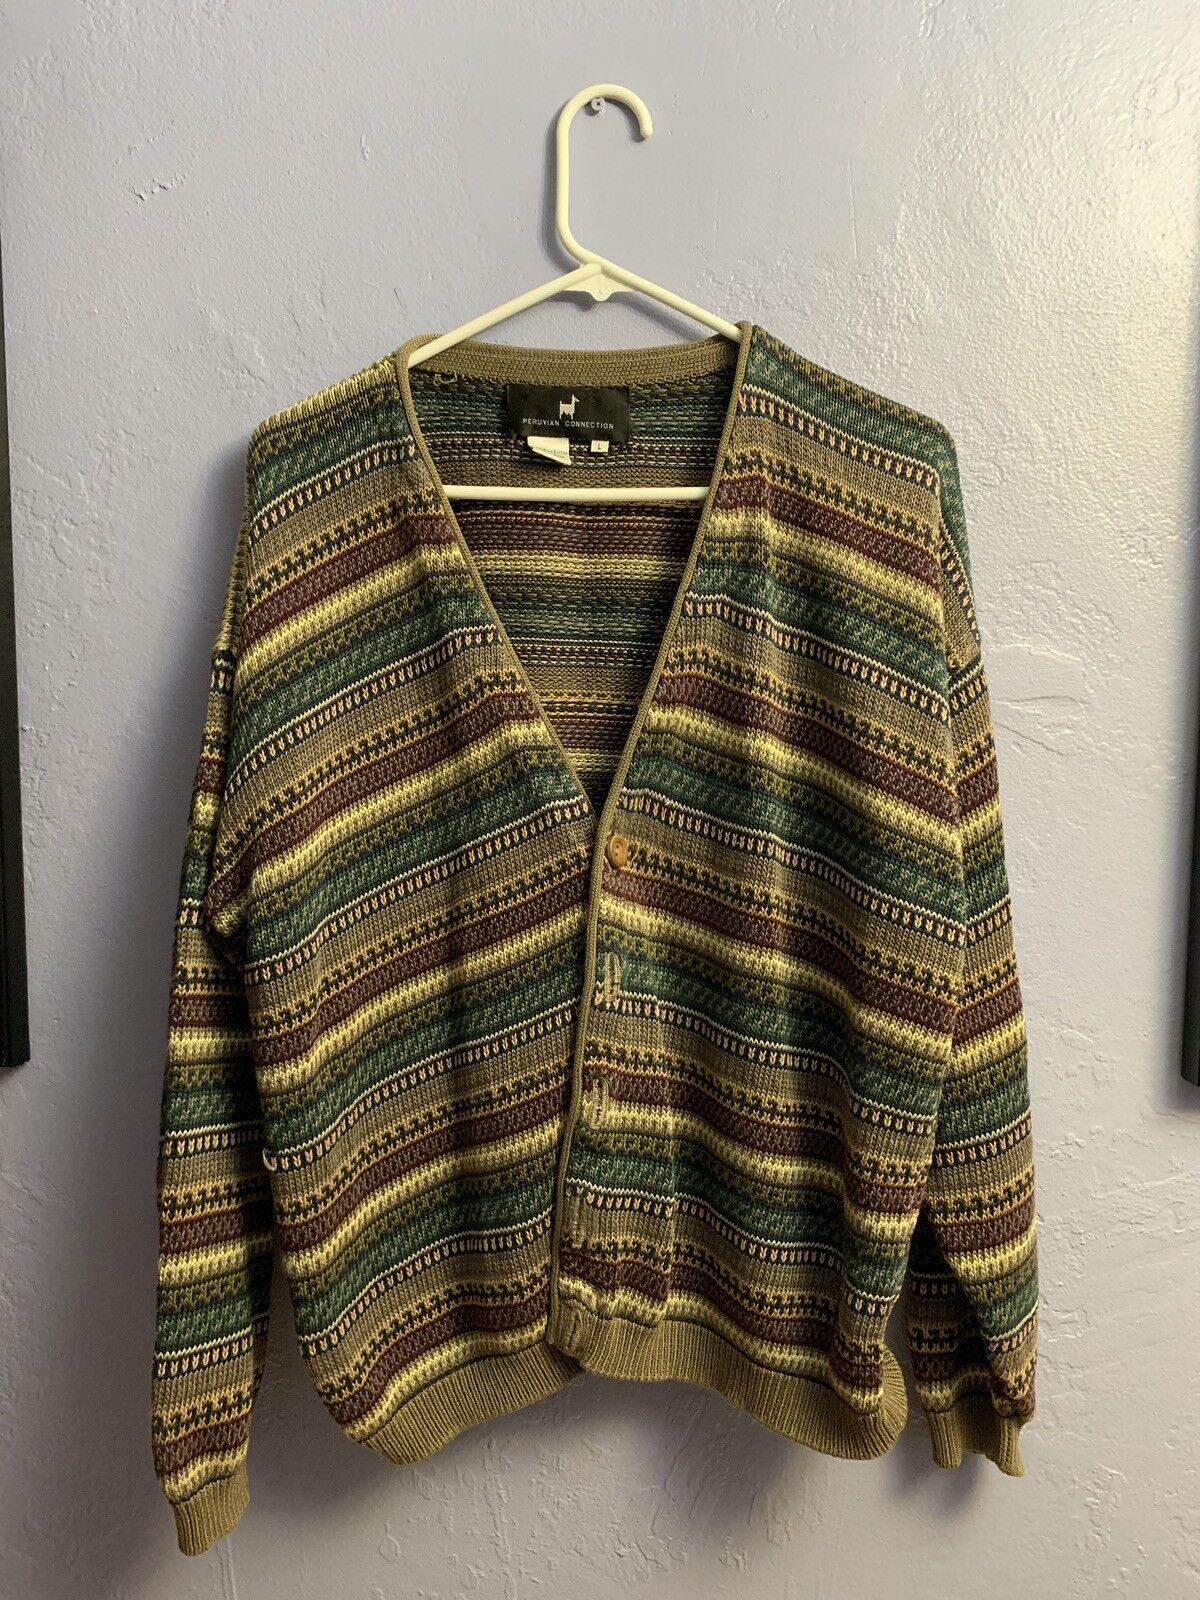 Peruvian Connection Cardigan Cardigan Cardigan Sweater Pima Cotton Size L be65c5